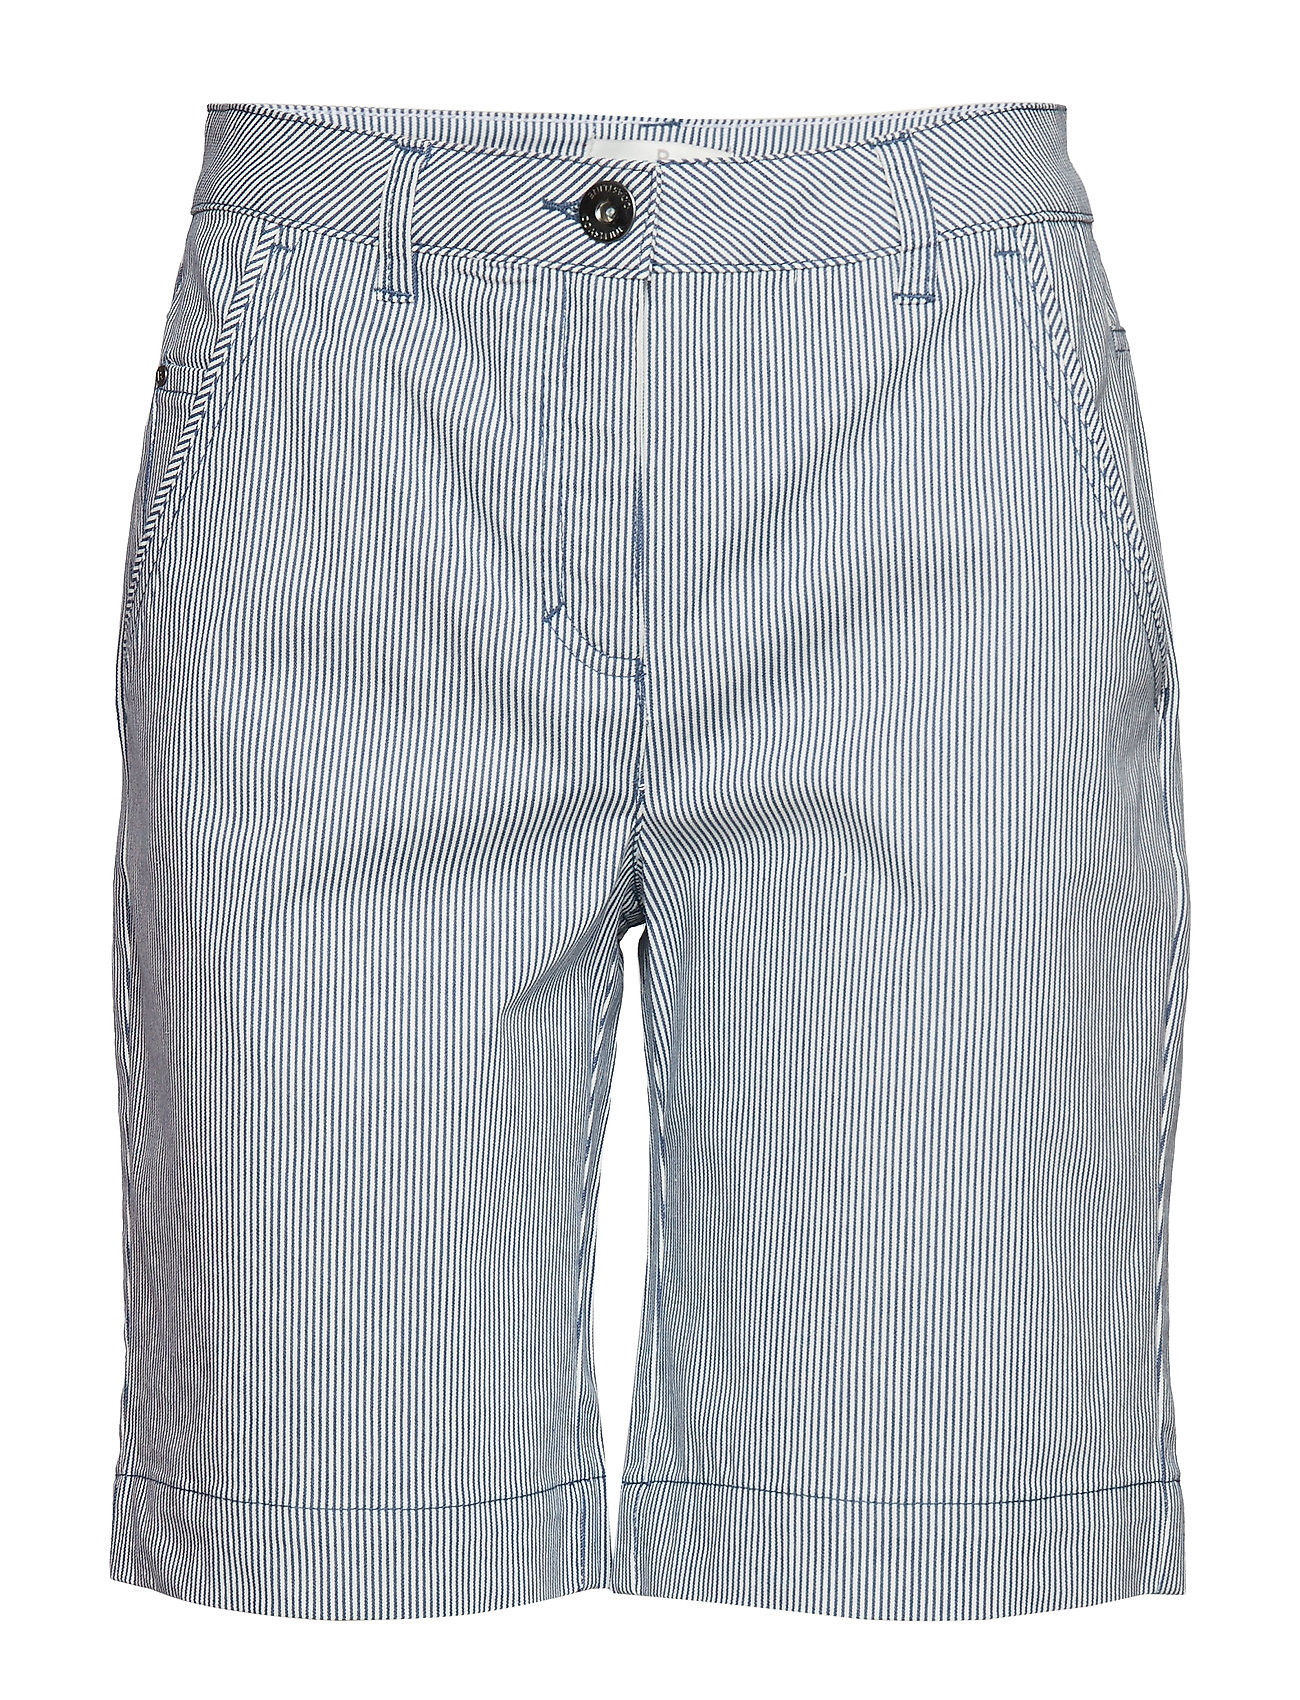 Brandtex Casual shorts - DENIM LIGHT BLUE